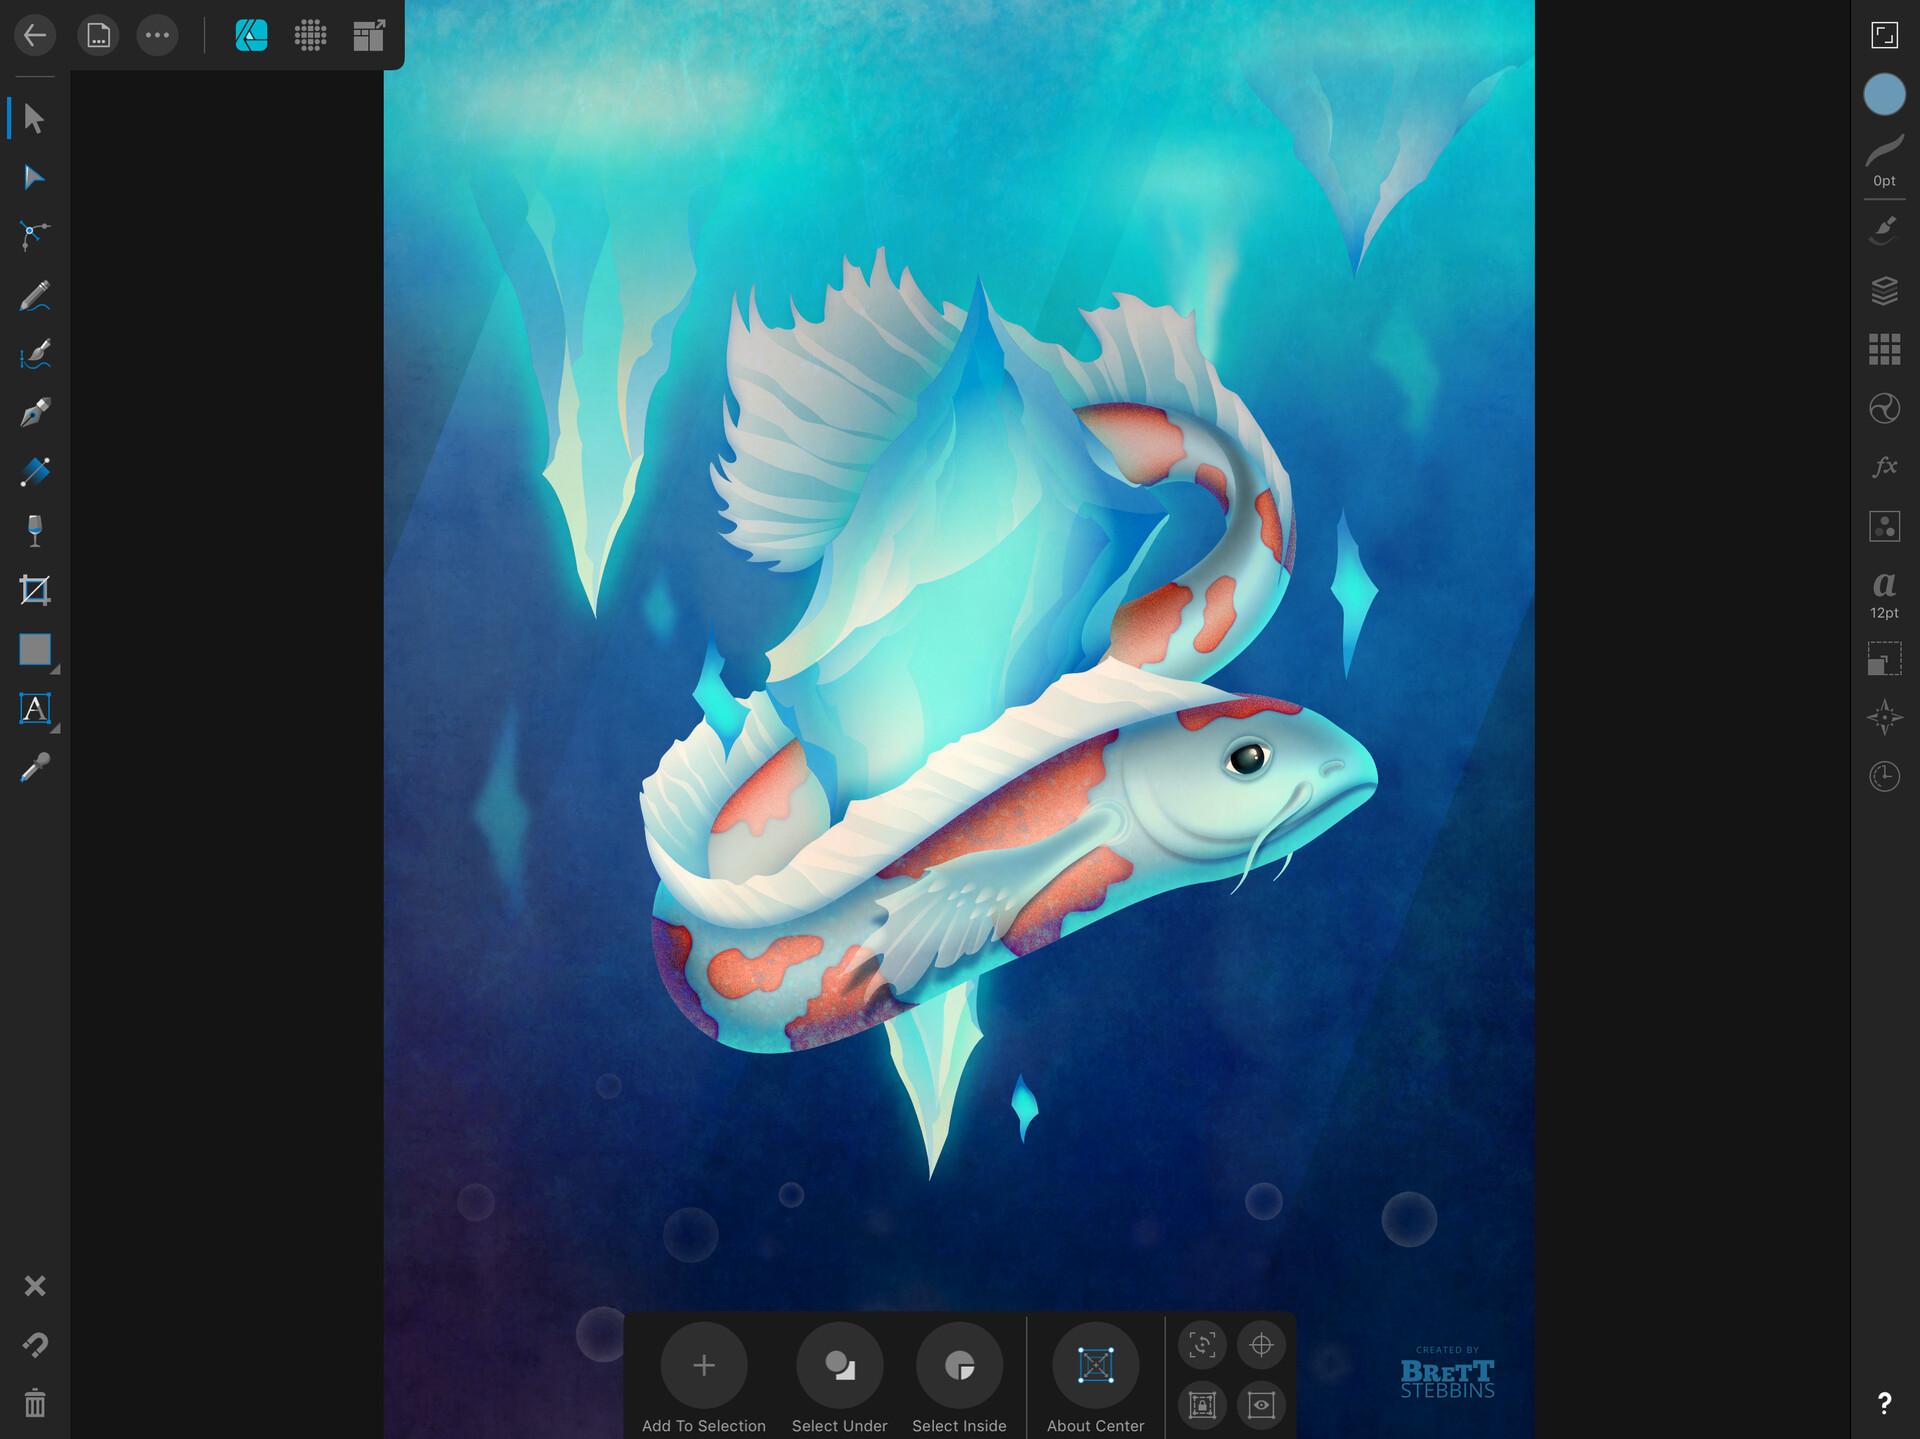 Brett stebbins koi eel 01 screenshot 01